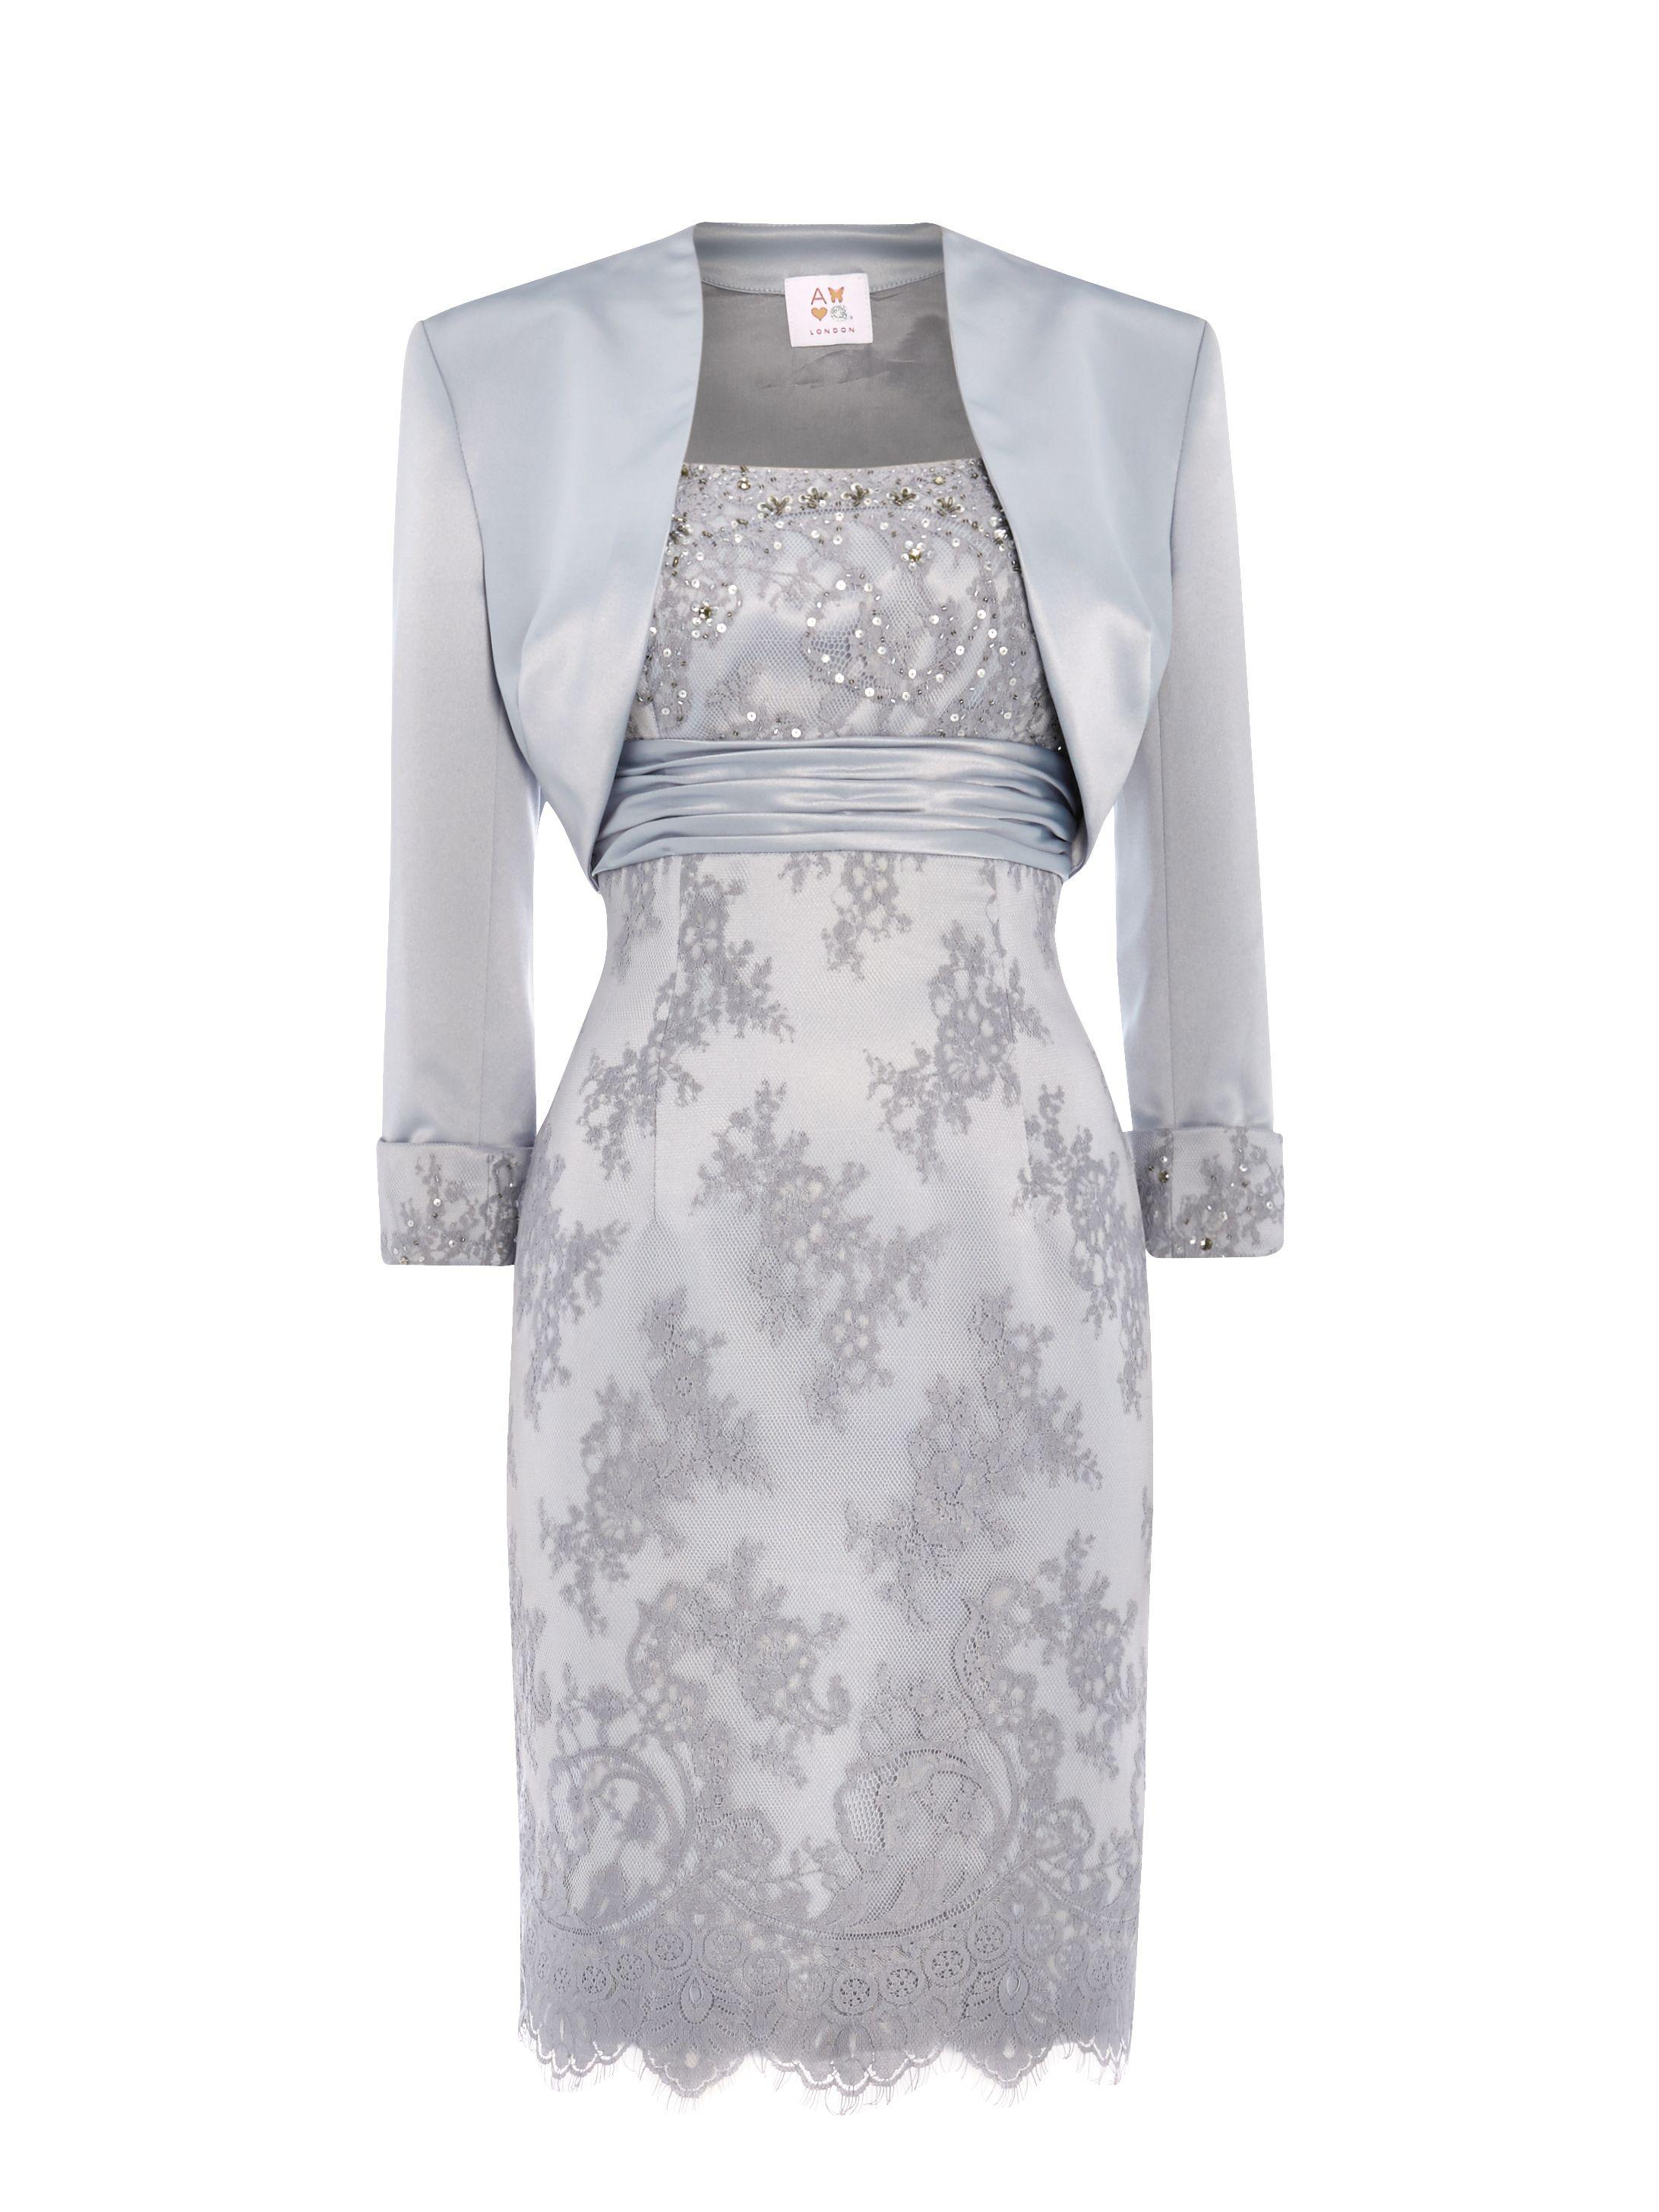 Platinum Mother of the Bride Dresses